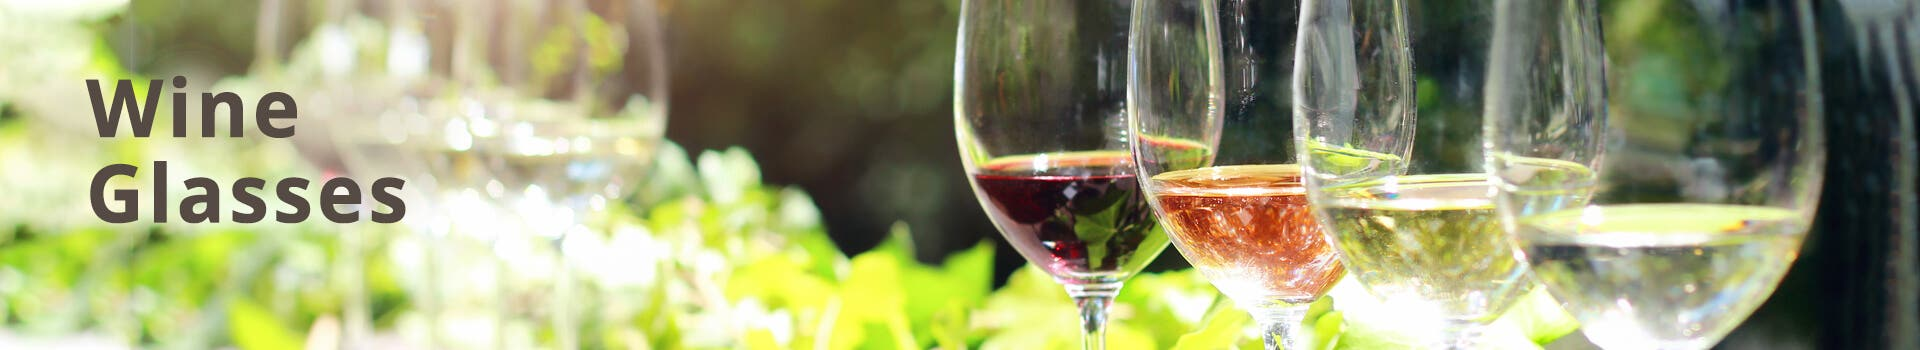 Round Wine Glasses